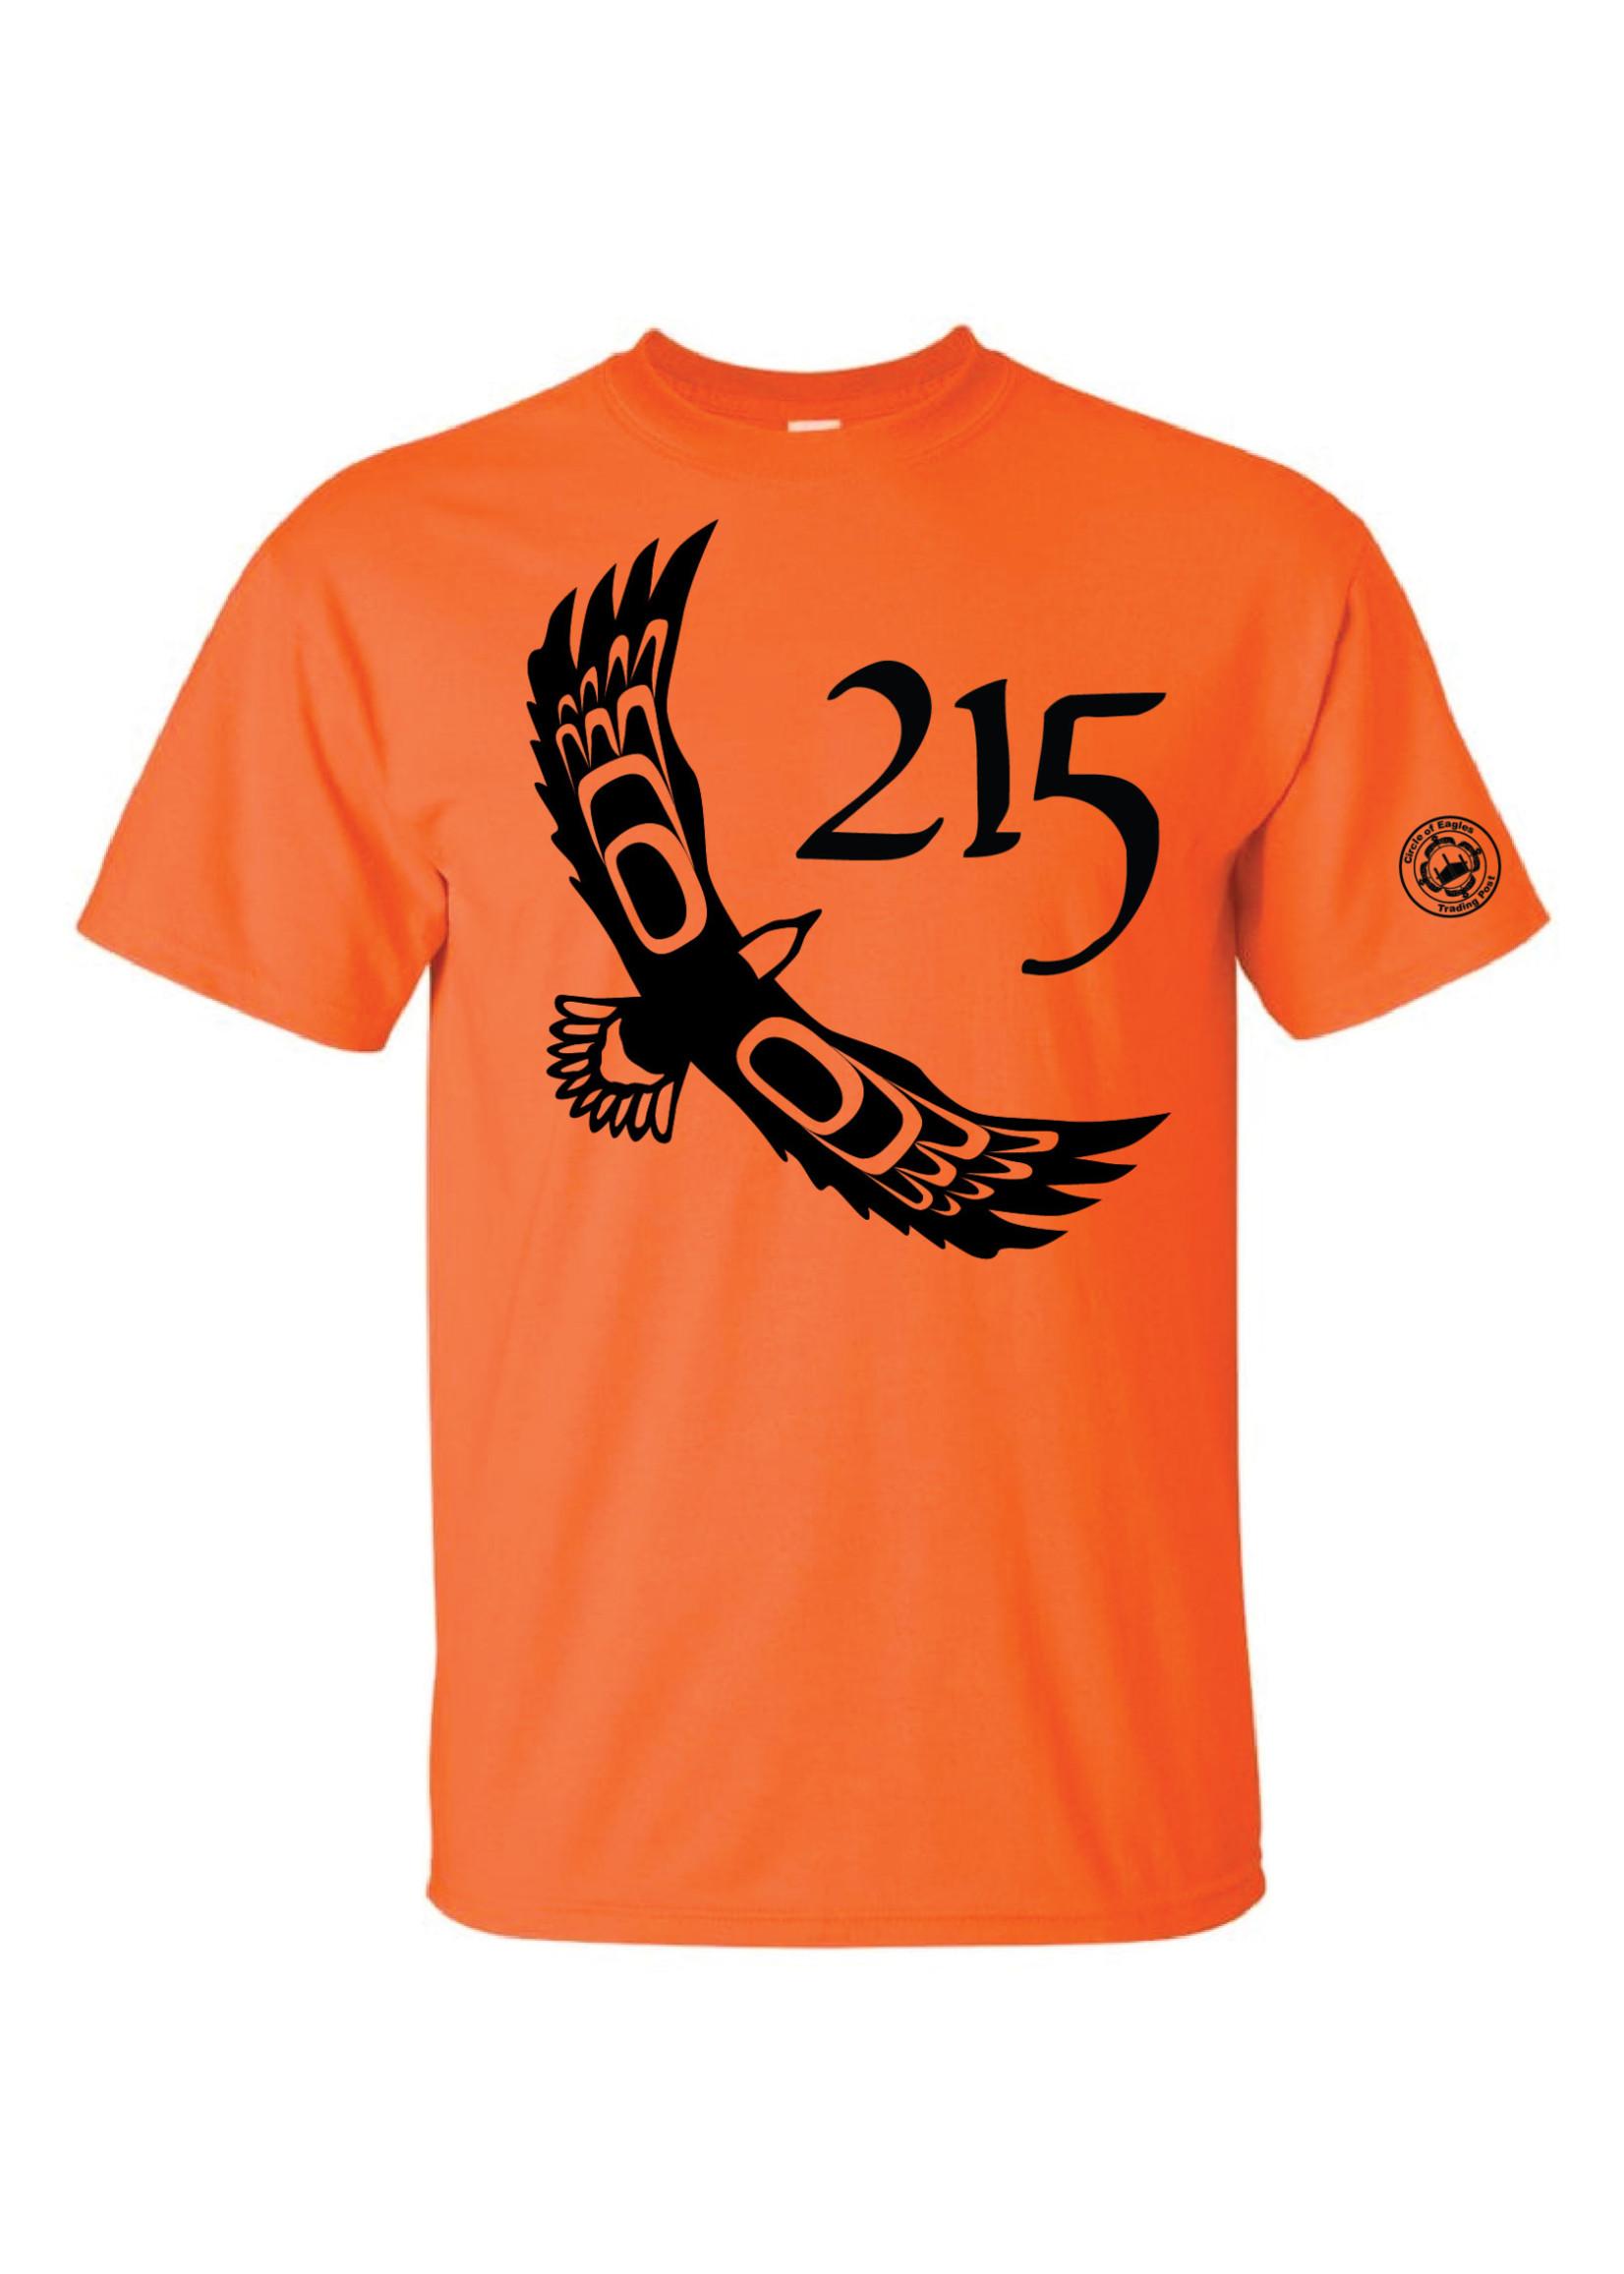 COELS Orange 215 T - Shirts